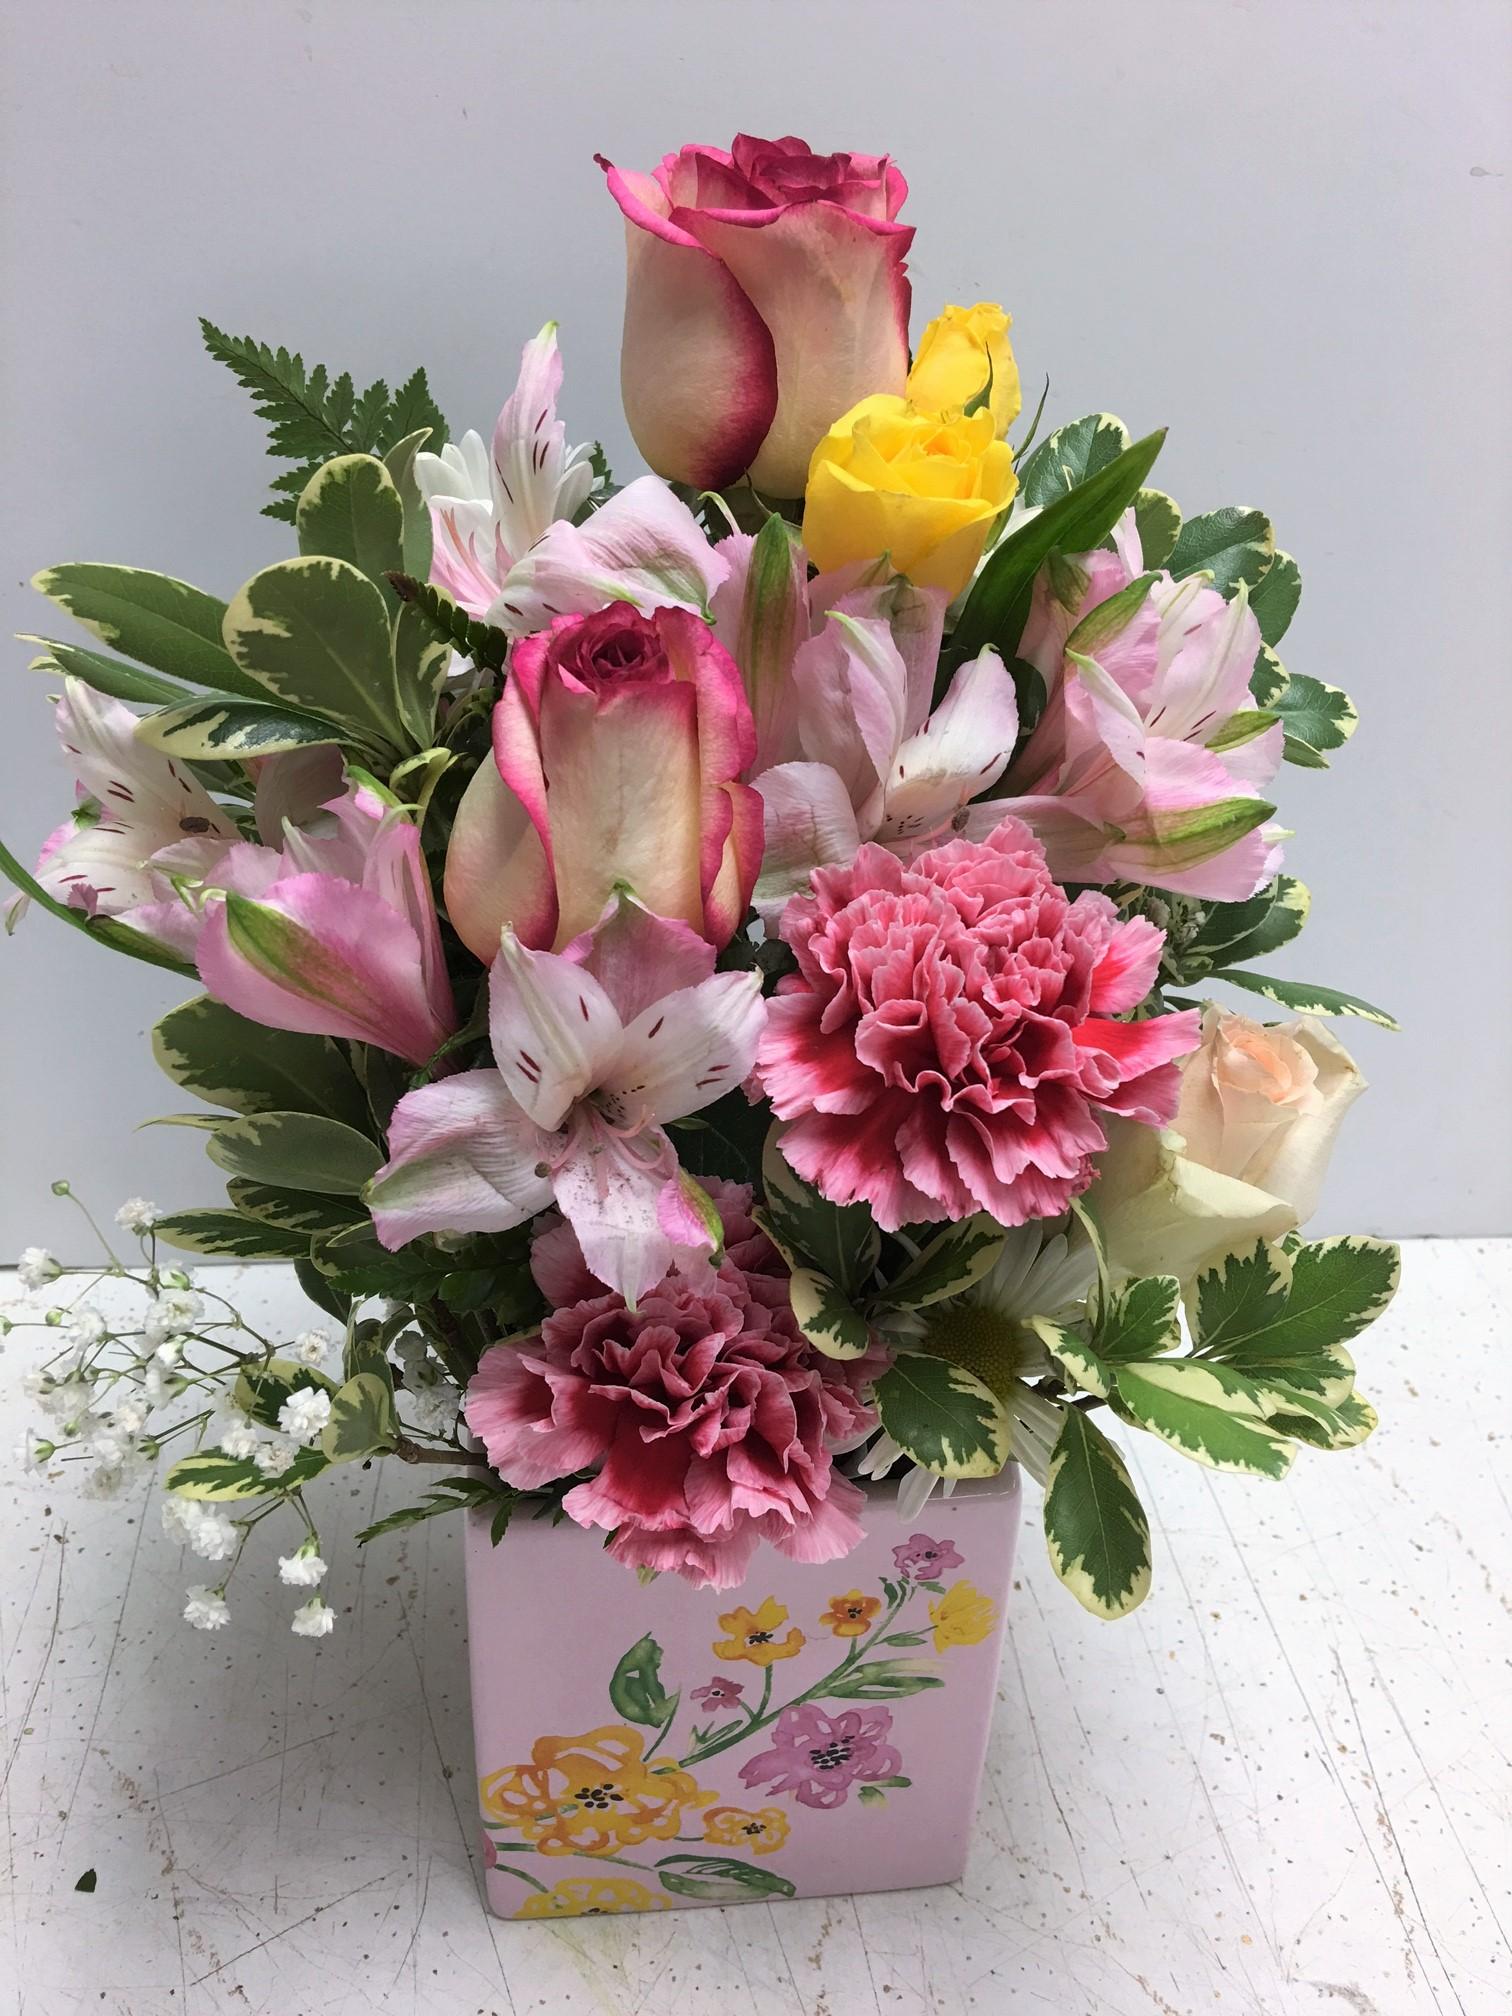 Penelopes Pink 35 5999 Baby Flowers Birthday Short Sassy